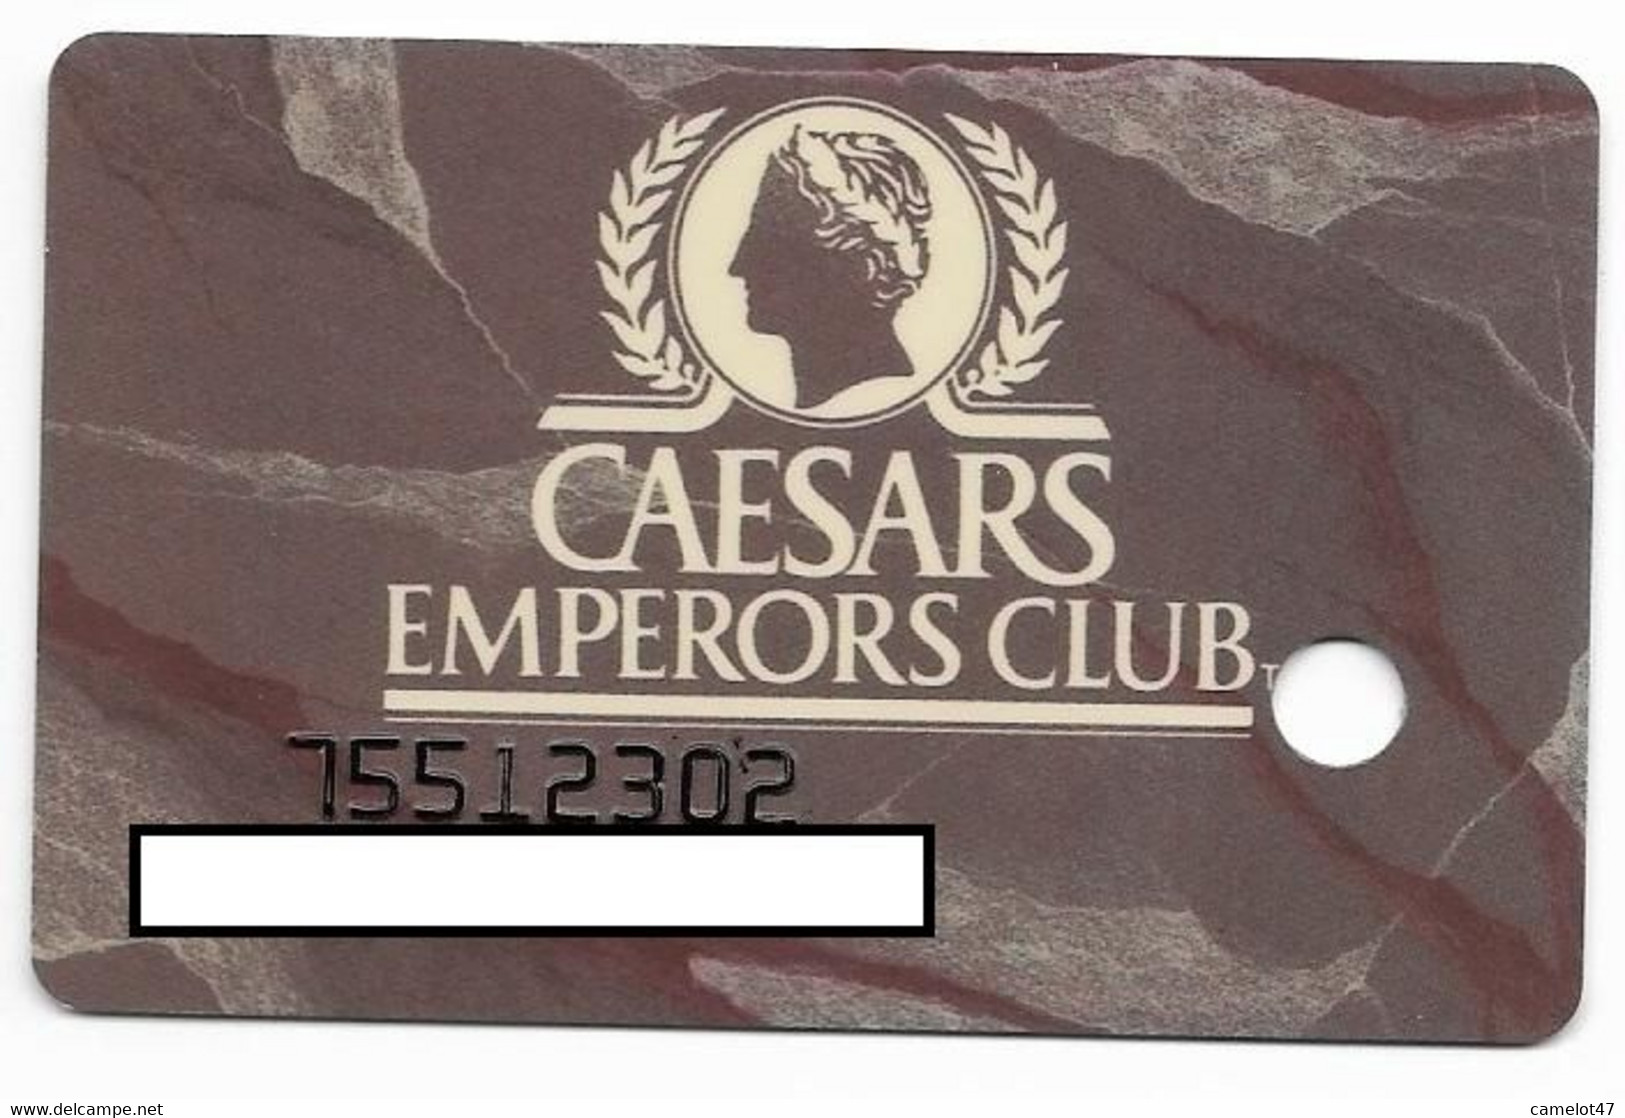 Caesars Palace Casino,Las Vegas, Older Used Slot Or Player's Card, # Caesars-4 - Casino Cards